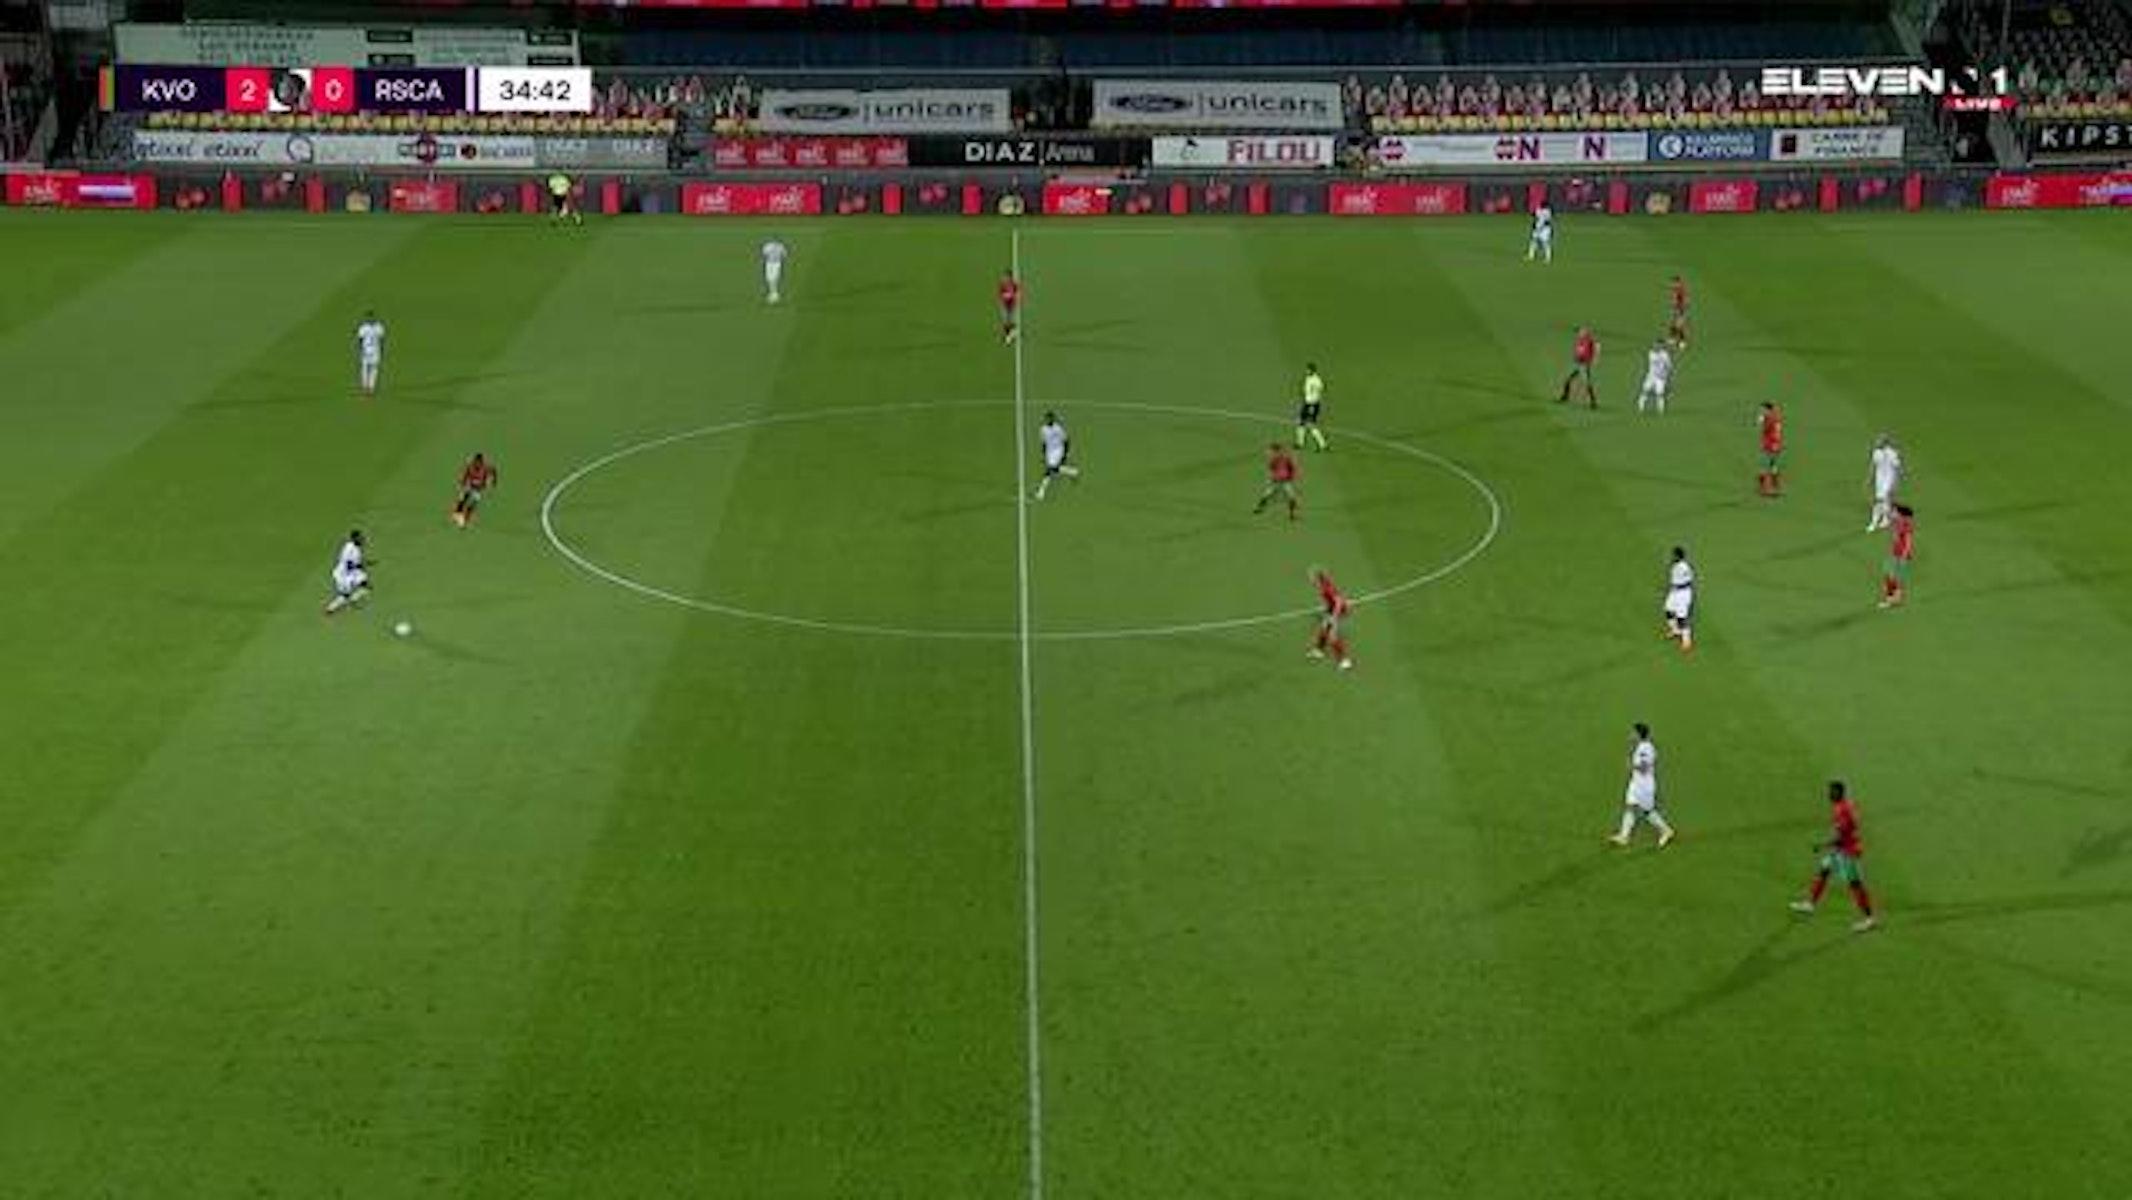 Doelpunt Adrien Trebel (KV Oostende vs. RSC Anderlecht)